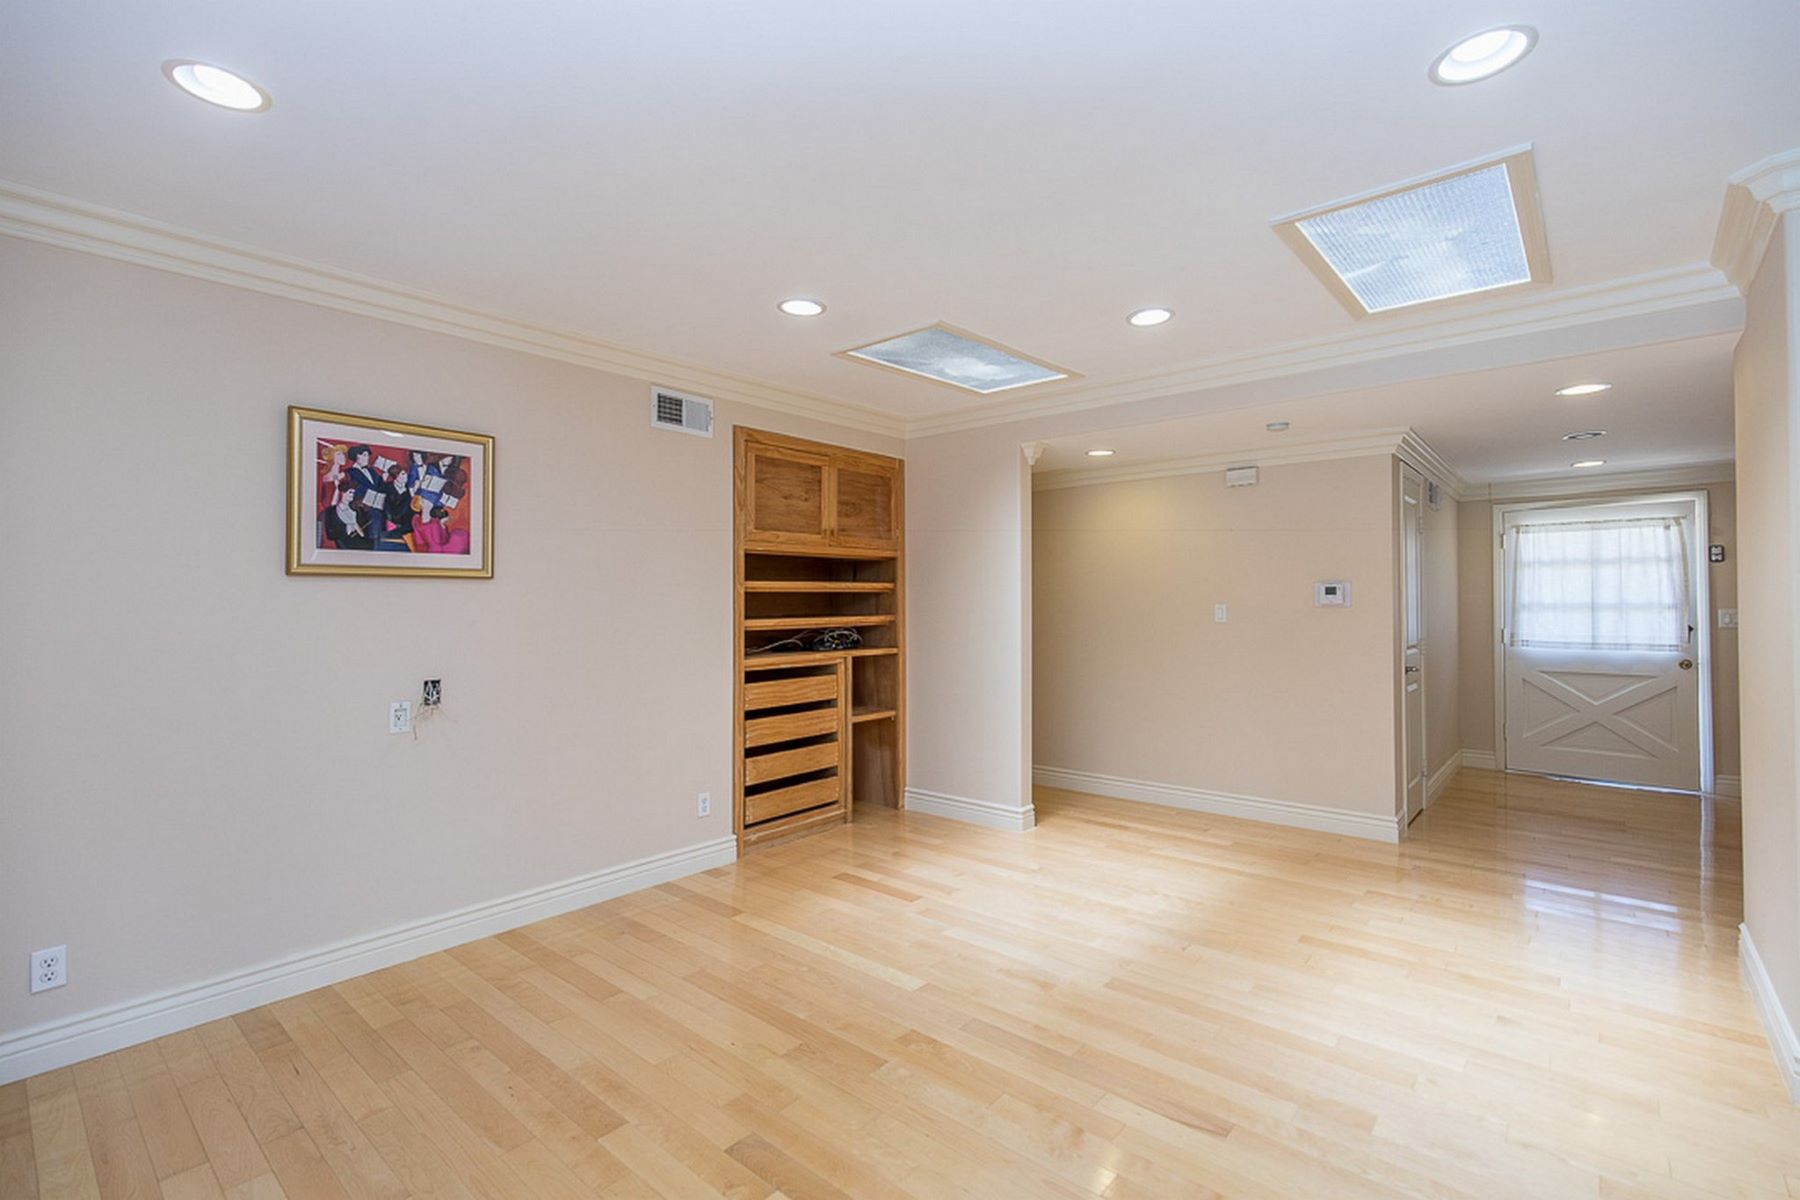 واحد منزل الأسرة للـ Sale في 1050 Camino Flores , Thousand Oaks Thousand Oaks, California, 91360 United States